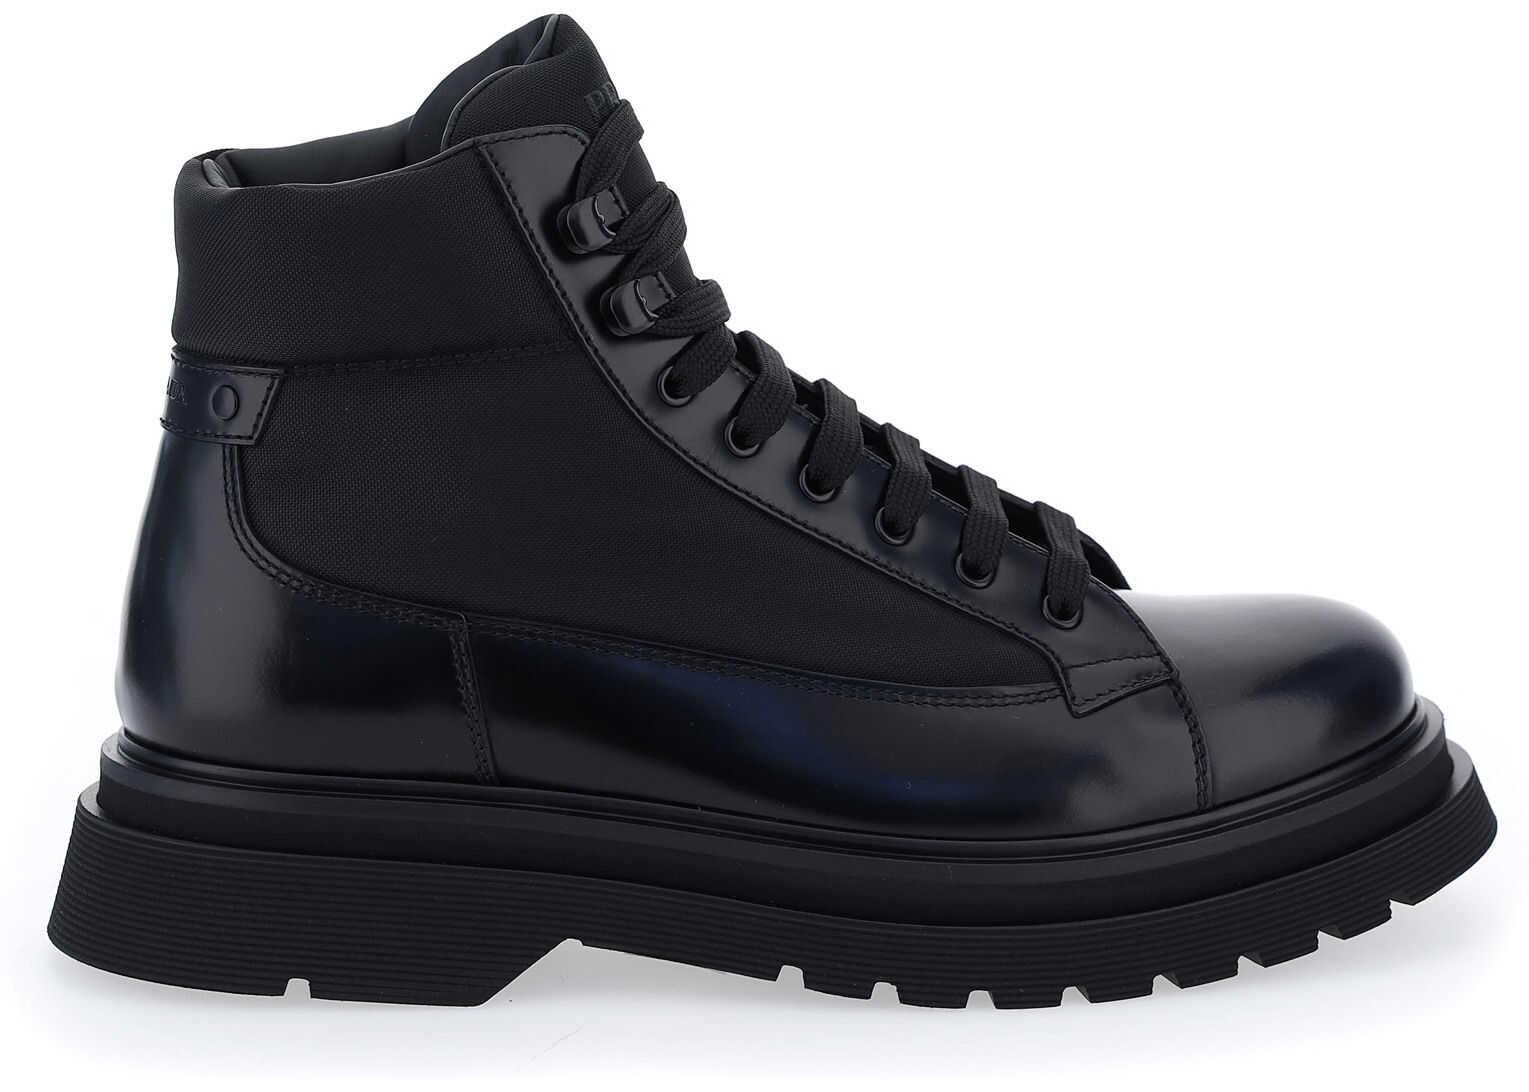 Prada Boots 2TE1483KZP N/A imagine b-mall.ro